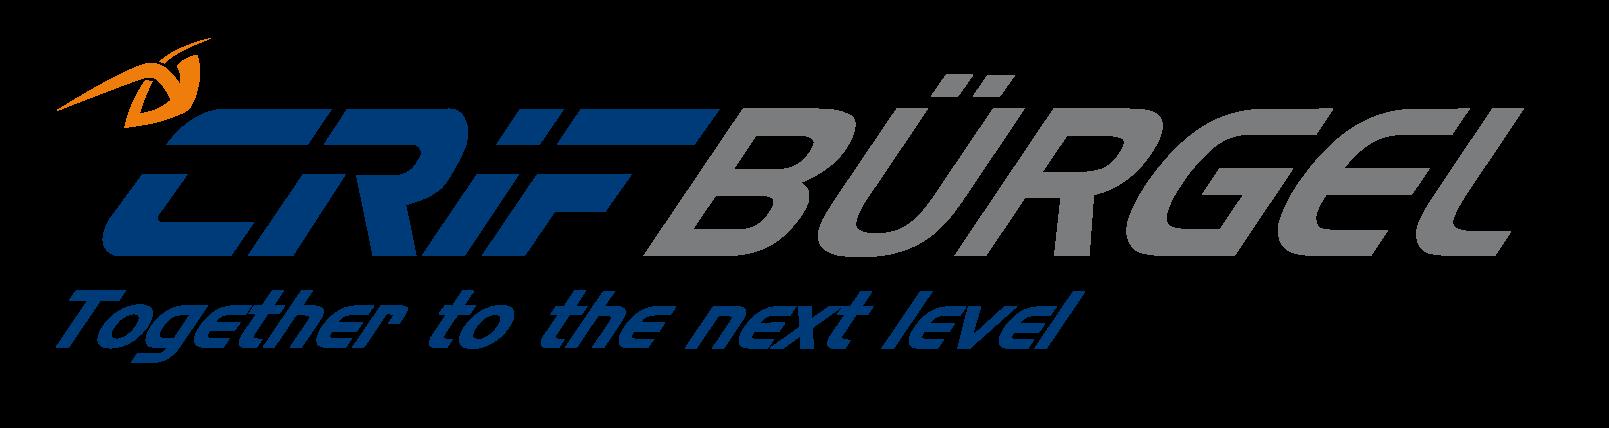 CRIF Bürgel Bankenscore Partner